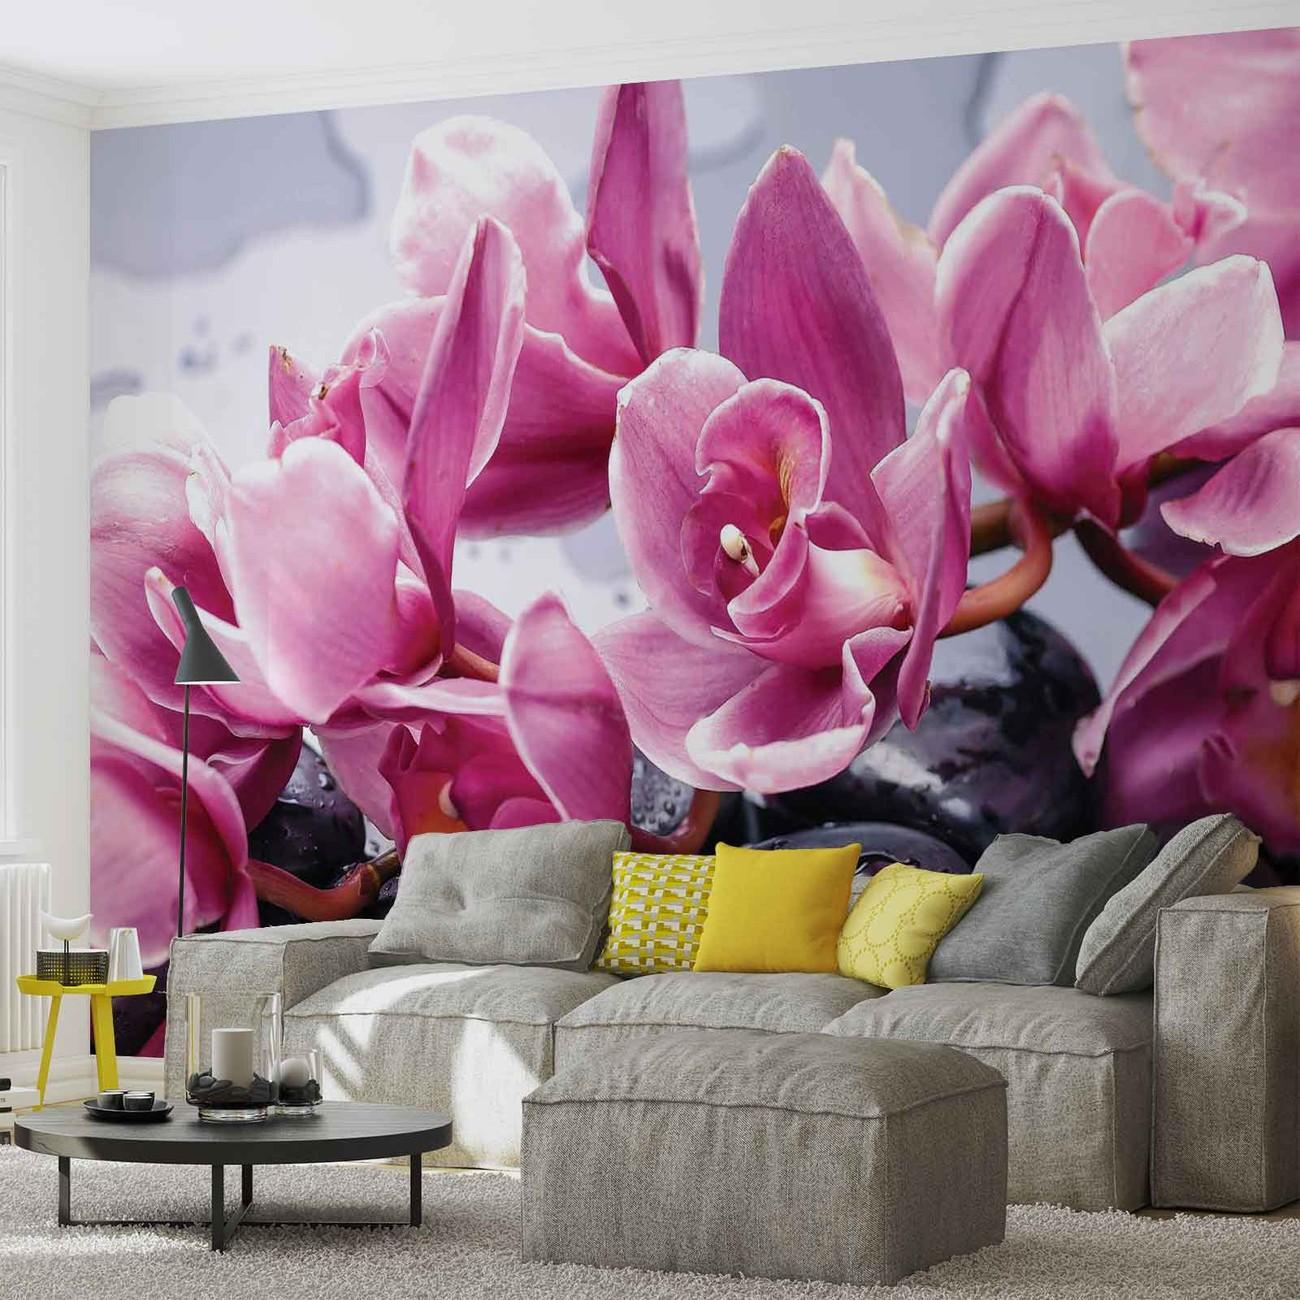 Fleurs orchid es pierres zen poster mural papier peint for Poster xxl mural zen